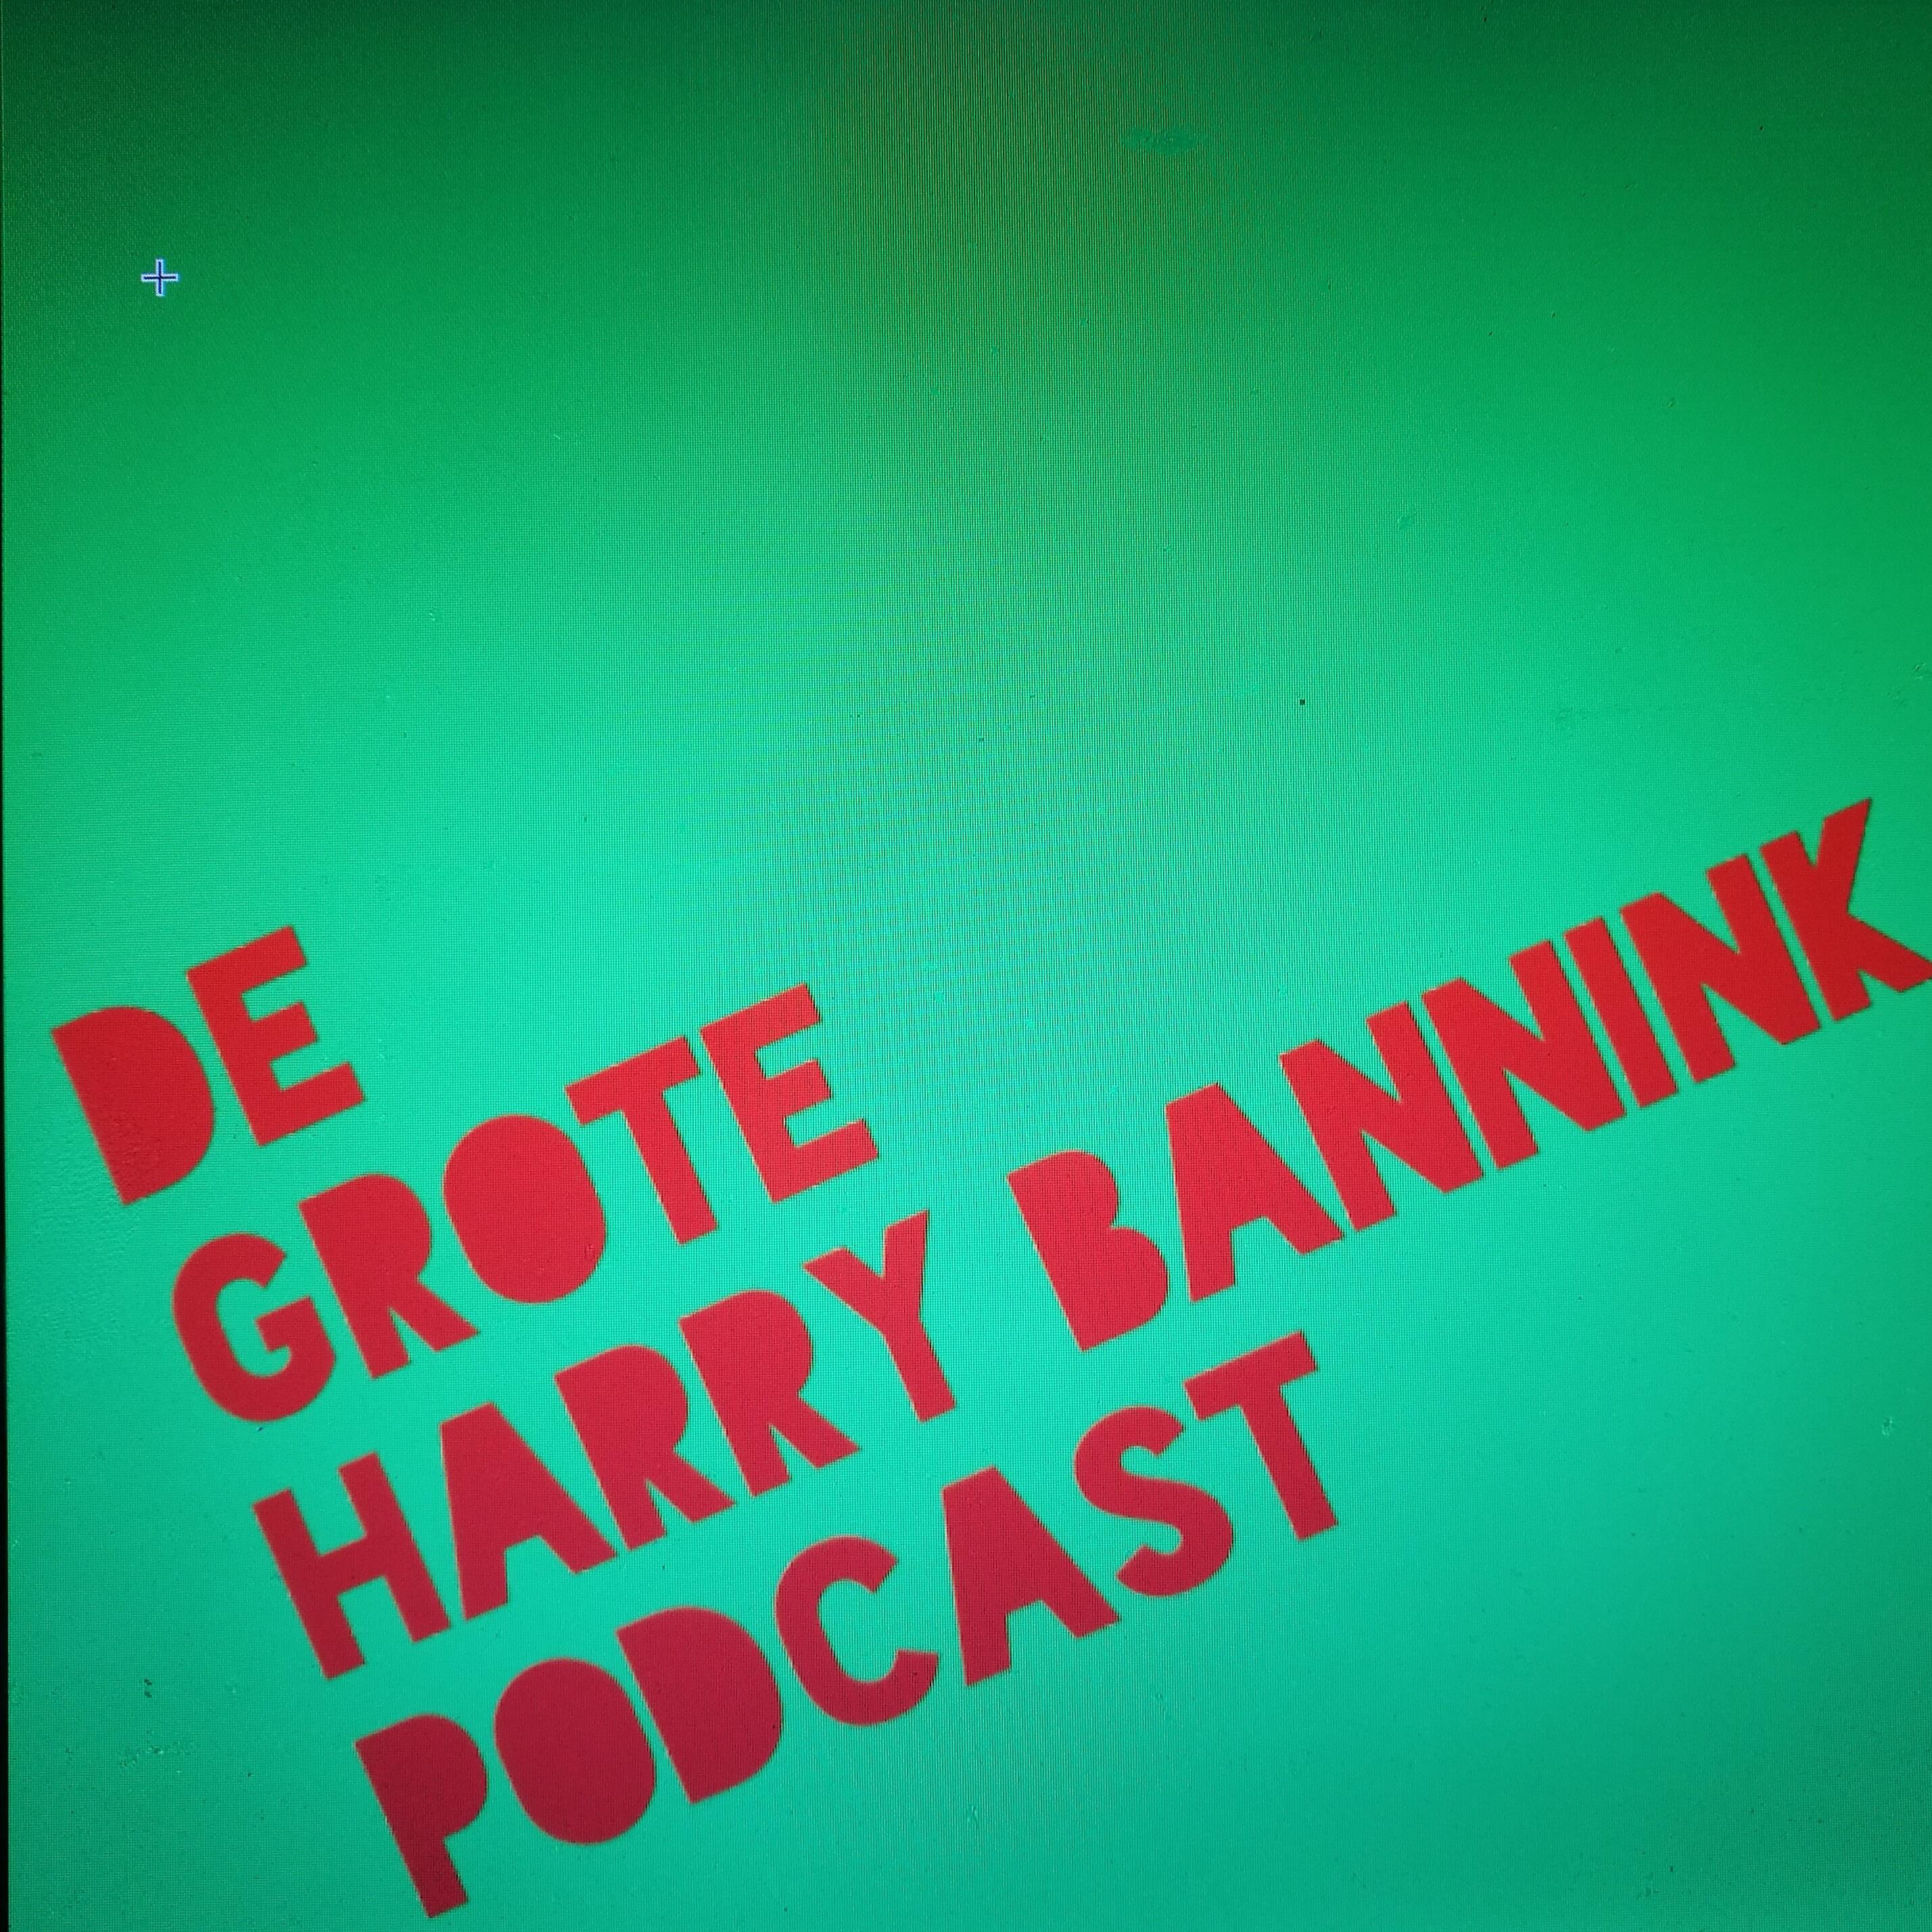 De Grote Harry Bannink Podcast logo